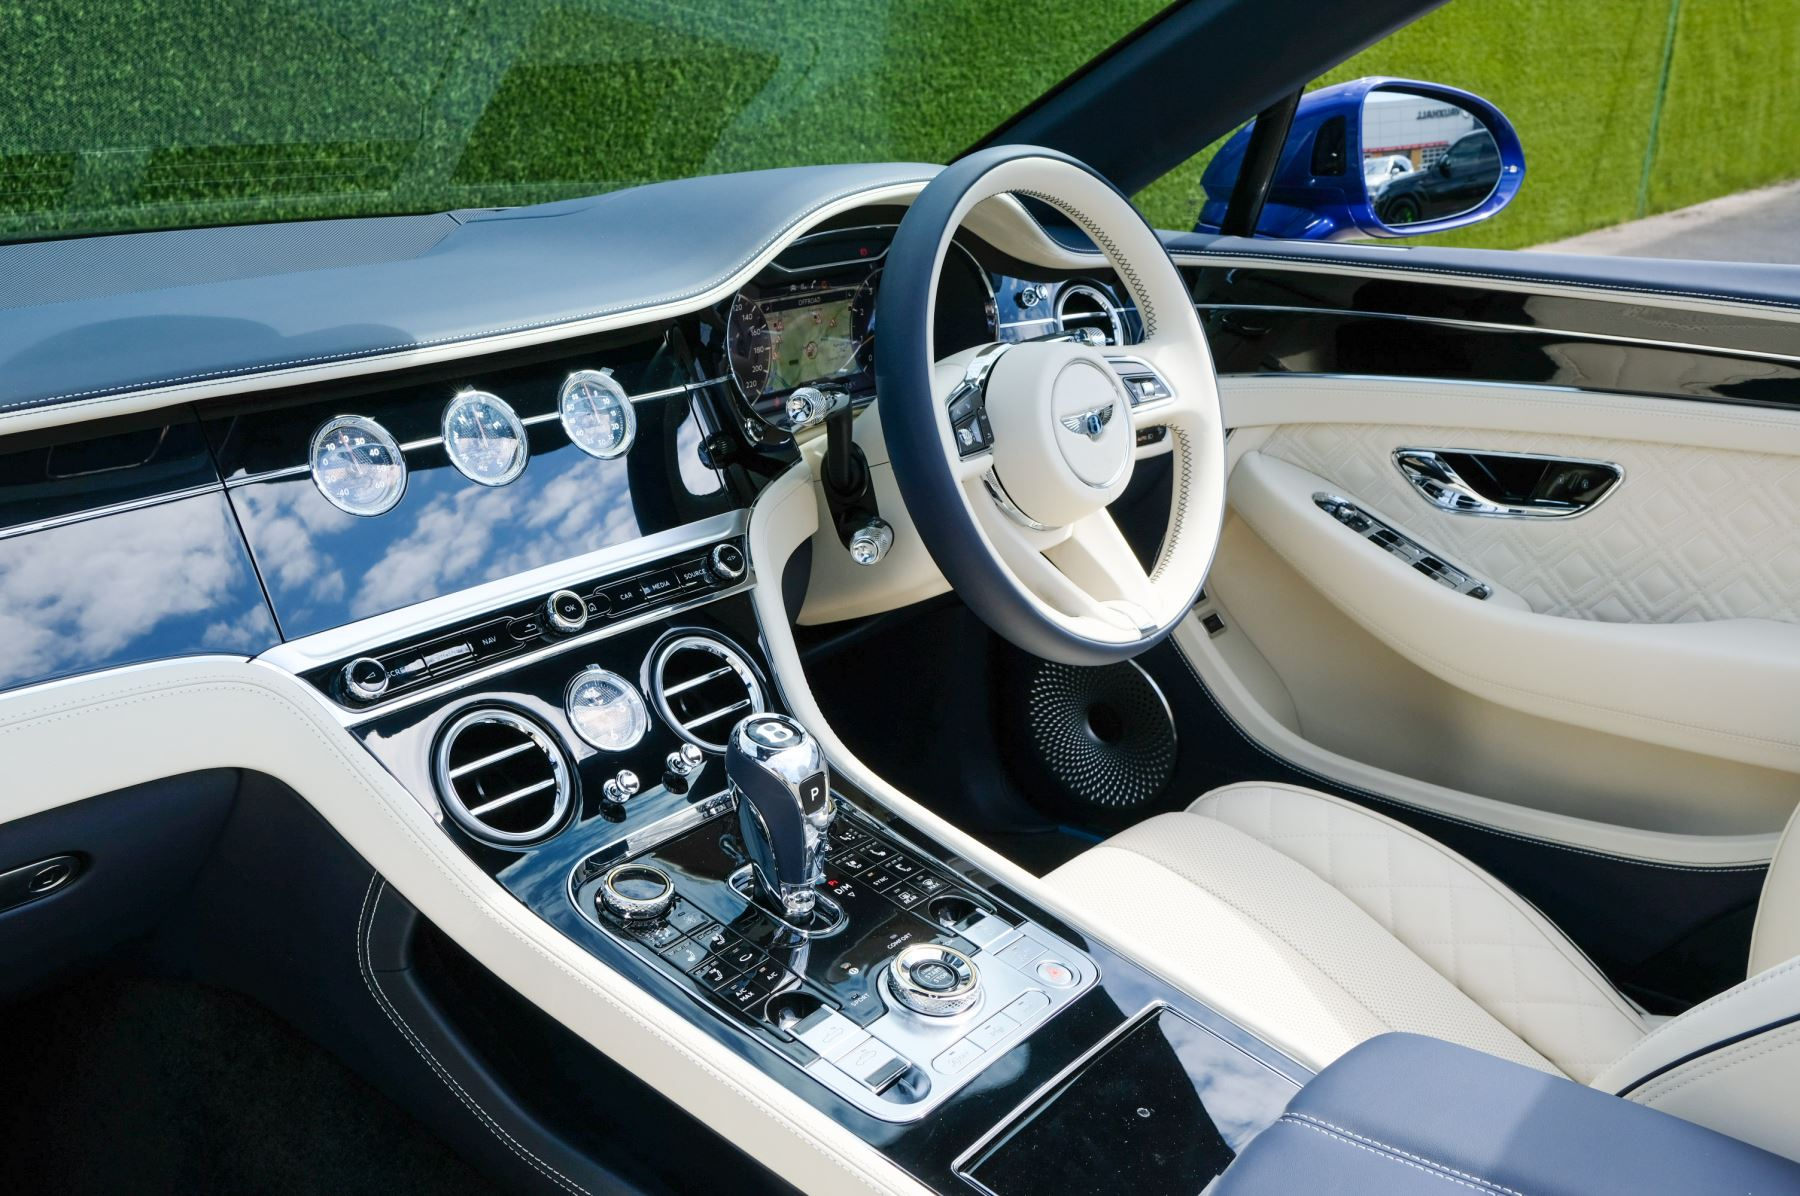 Bentley Continental GTC 4.0 V8 Mulliner Edition 2dr Auto [Tour Spec] image 11